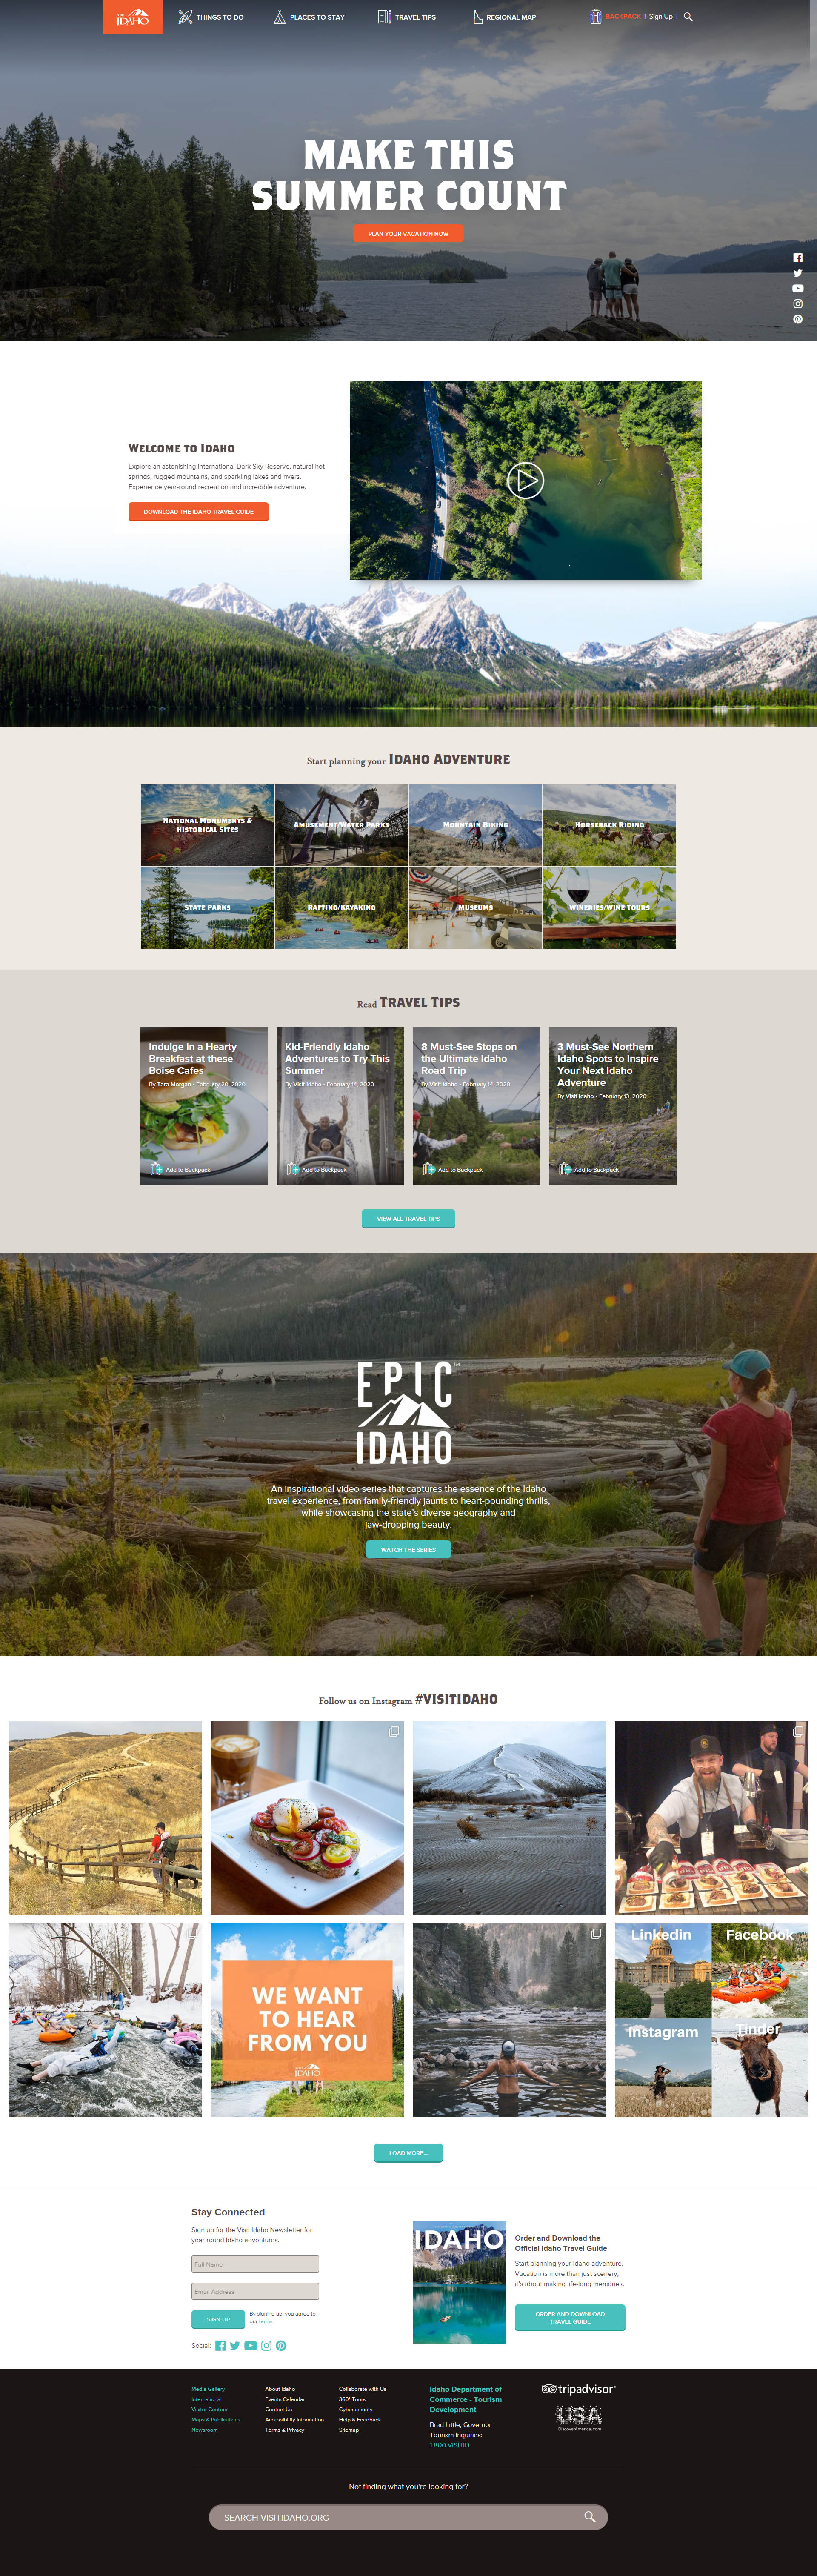 Previous Travel Tours Website Design Sample